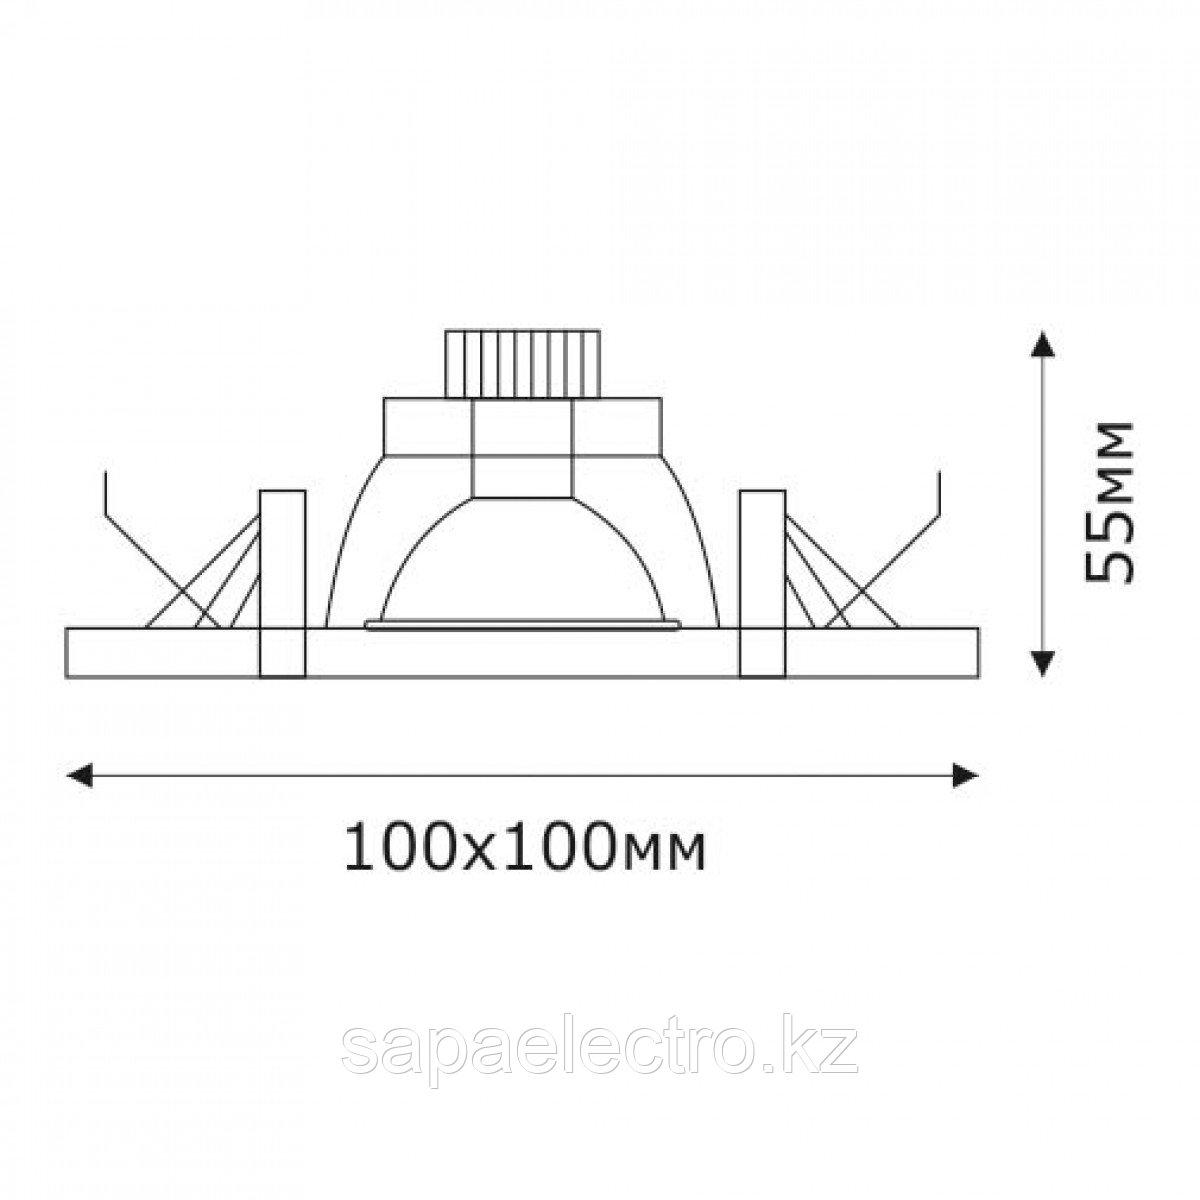 Спот LED JC65648-1 SQUARE 3W 5000K (TS) 60шт